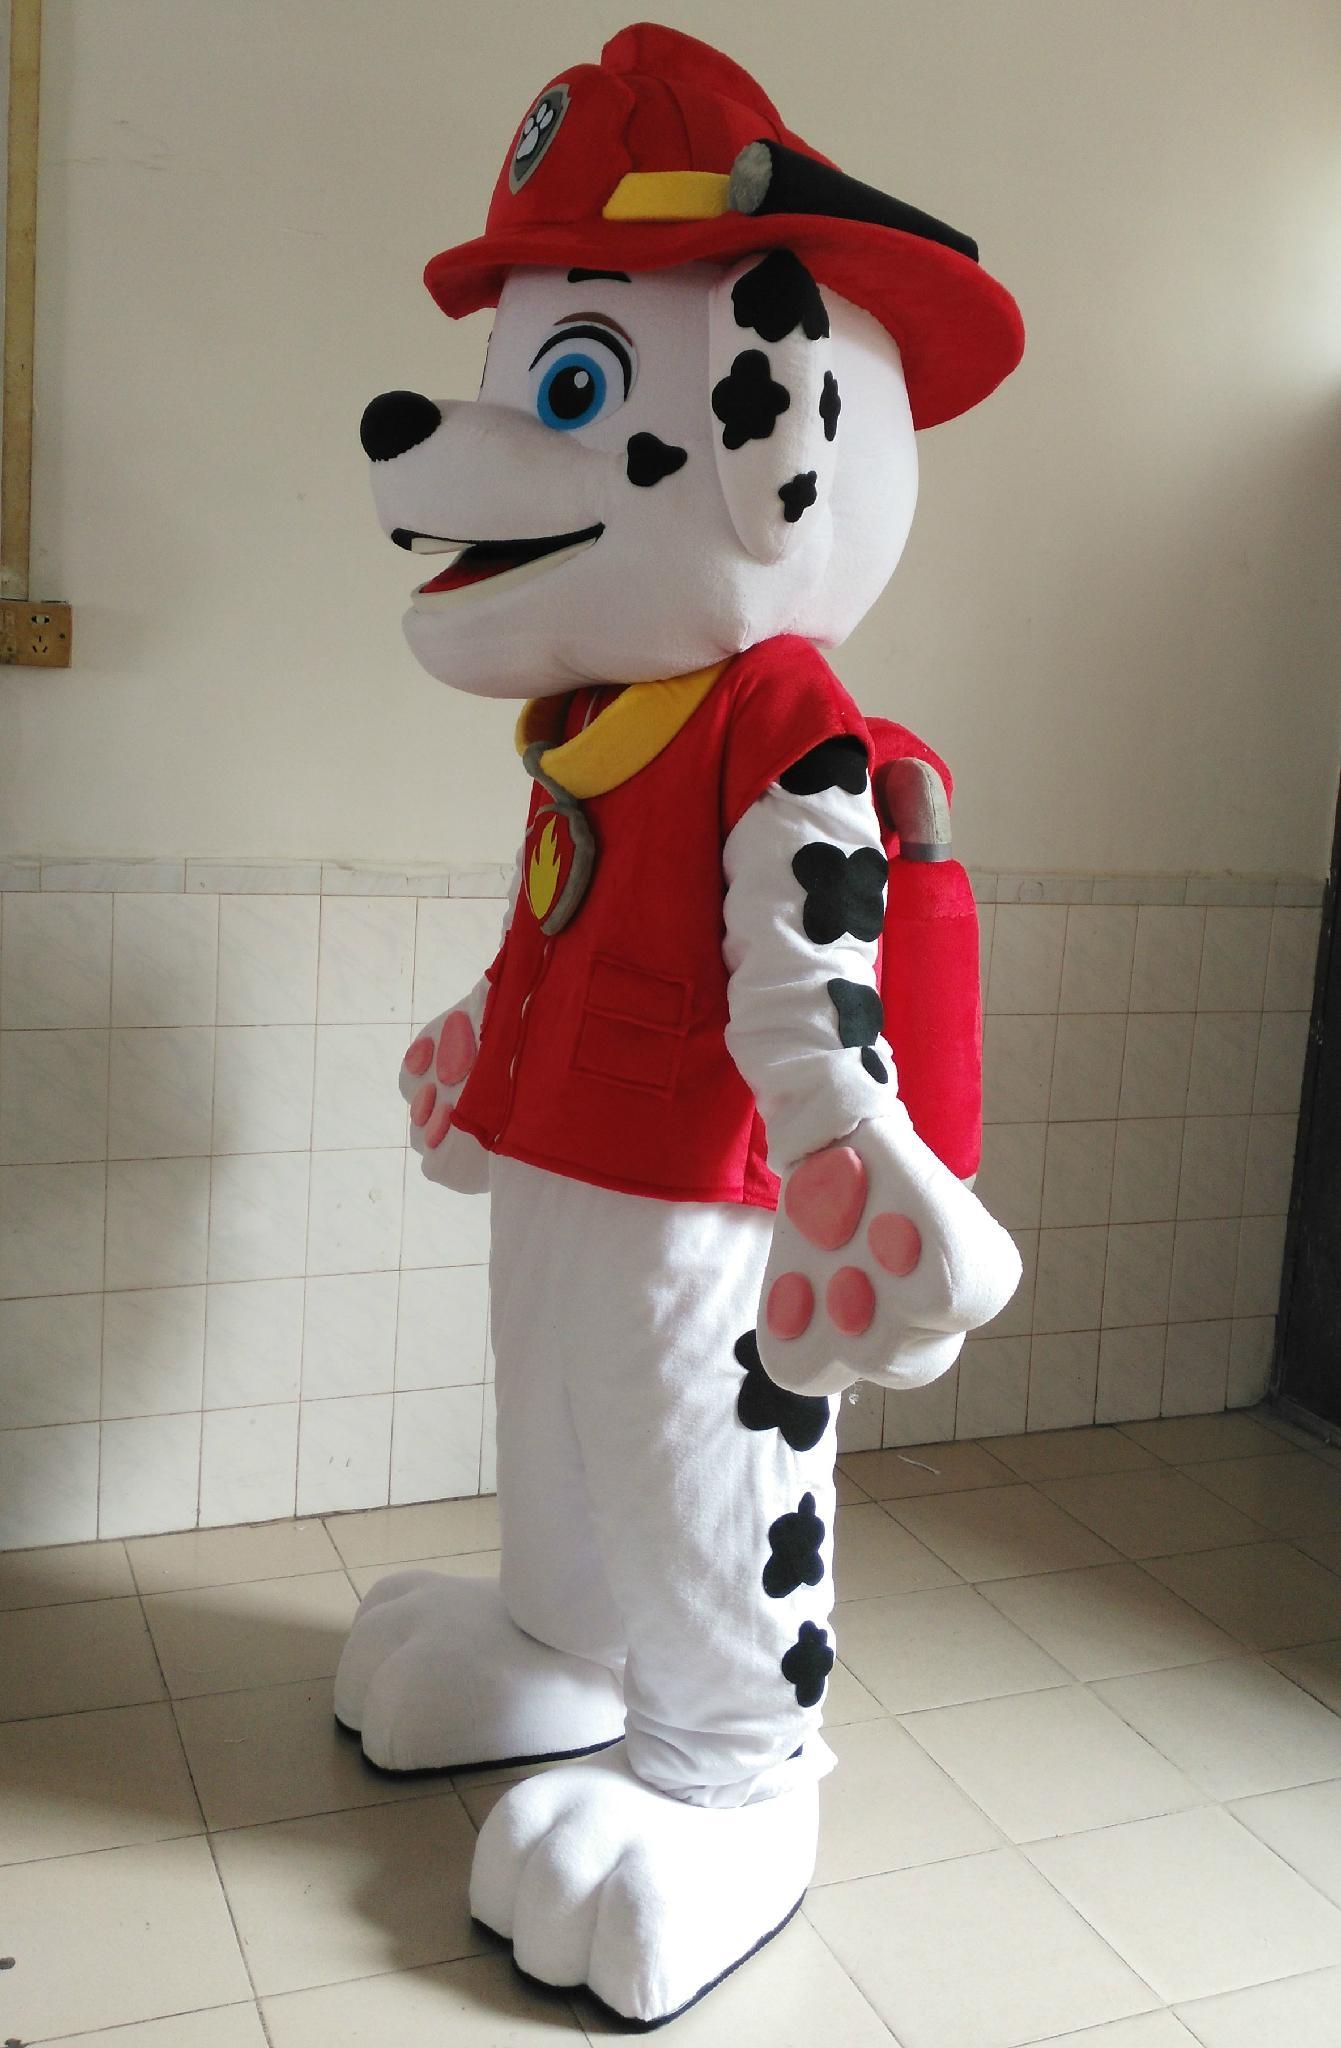 paw patrol mascot costume - sm137